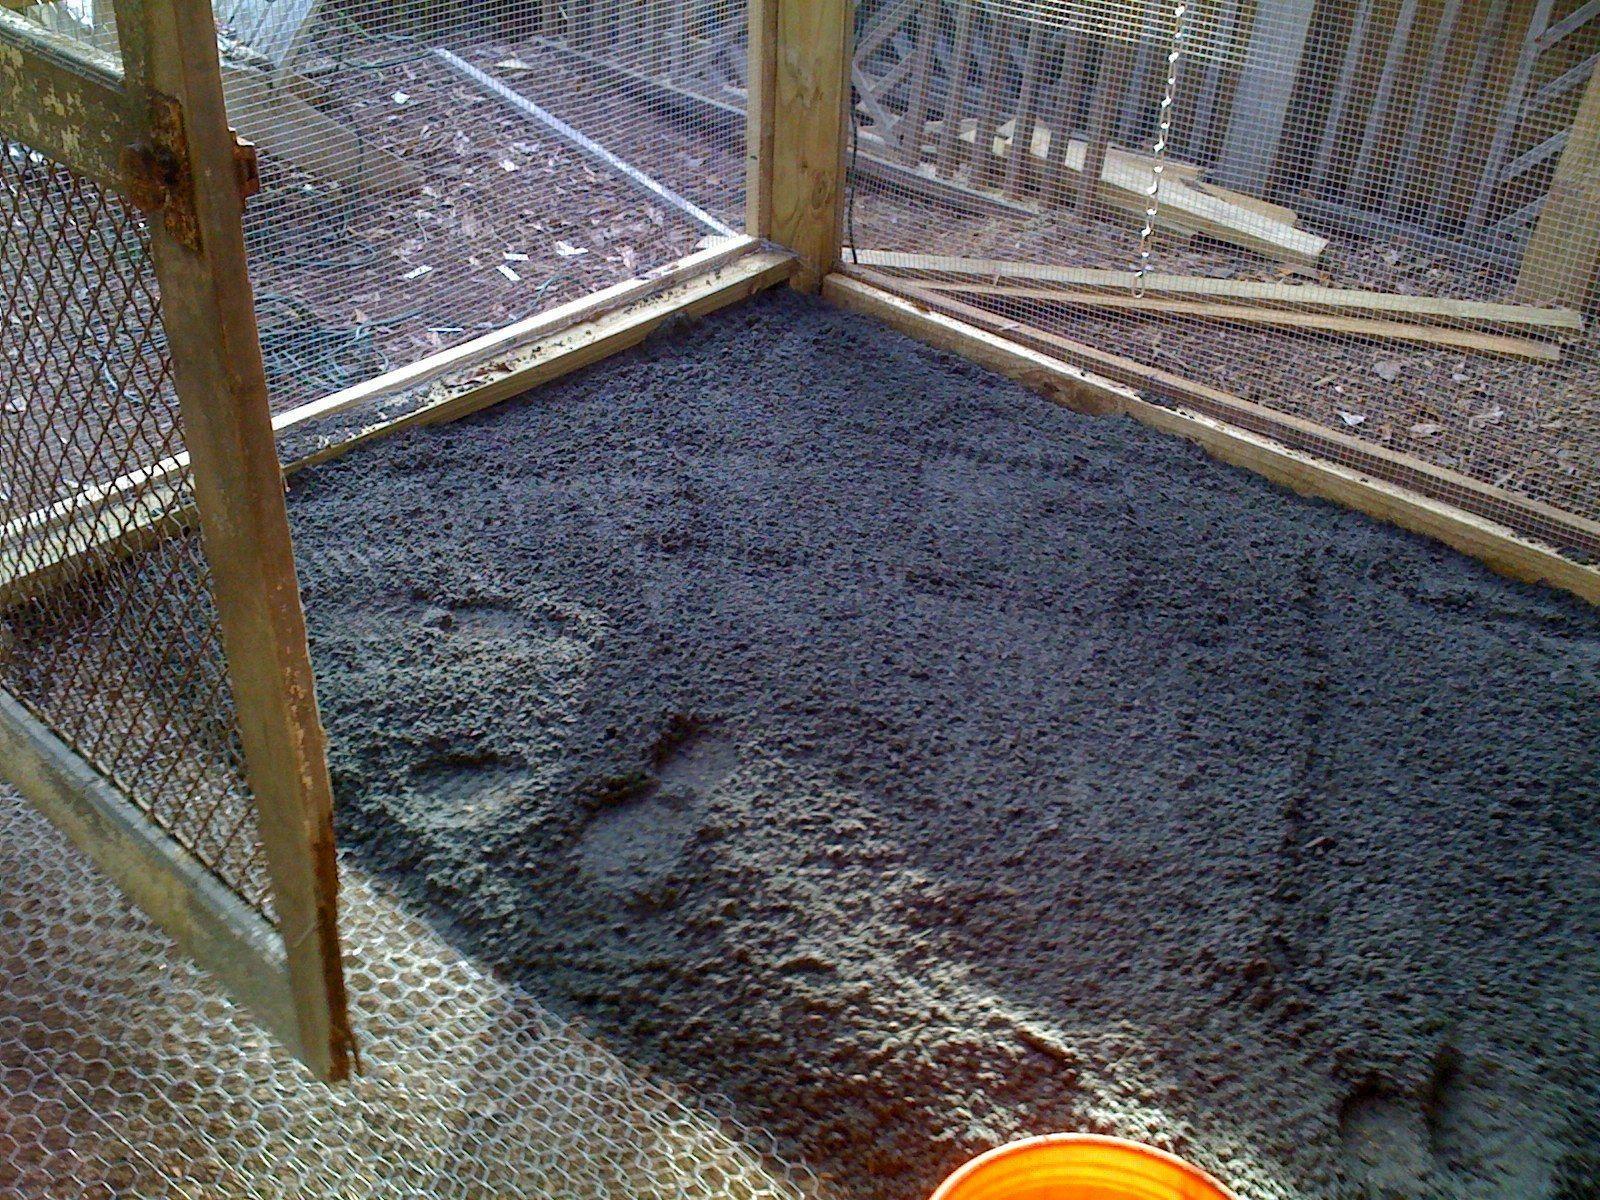 best flooring for run the atlanta backyard poultry meetup group